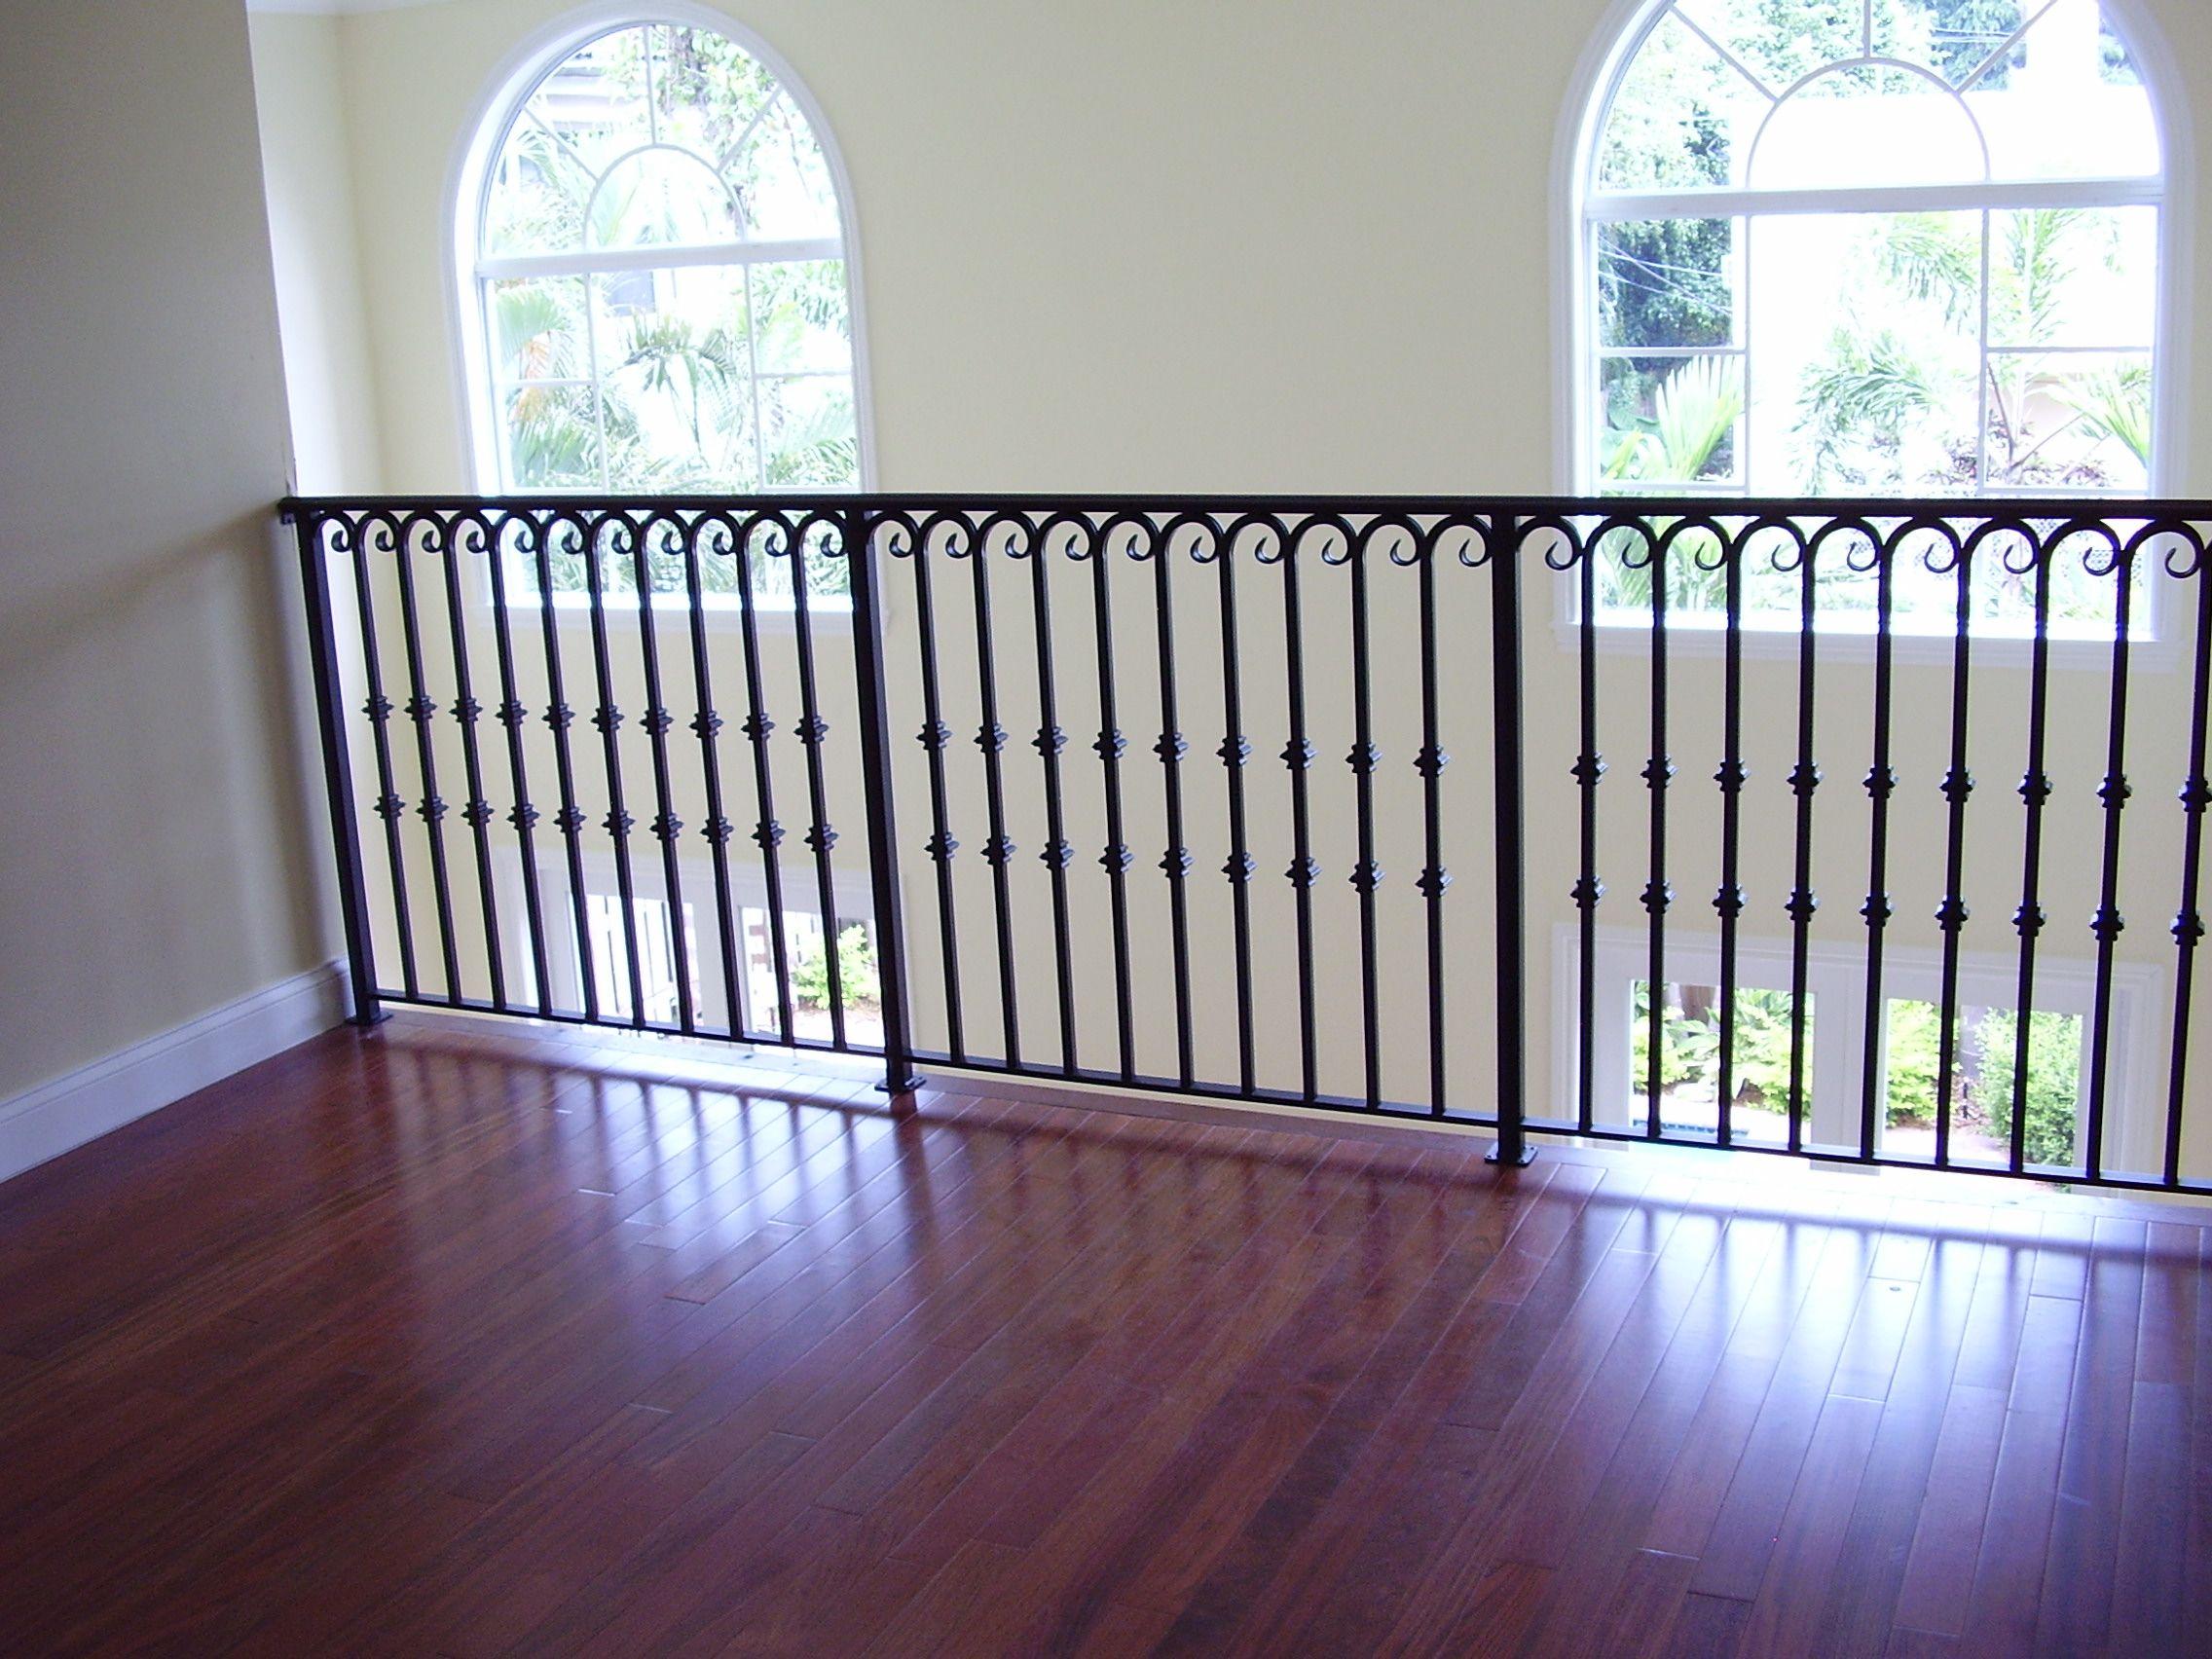 iron stair railings interior interior railings pro. Black Bedroom Furniture Sets. Home Design Ideas